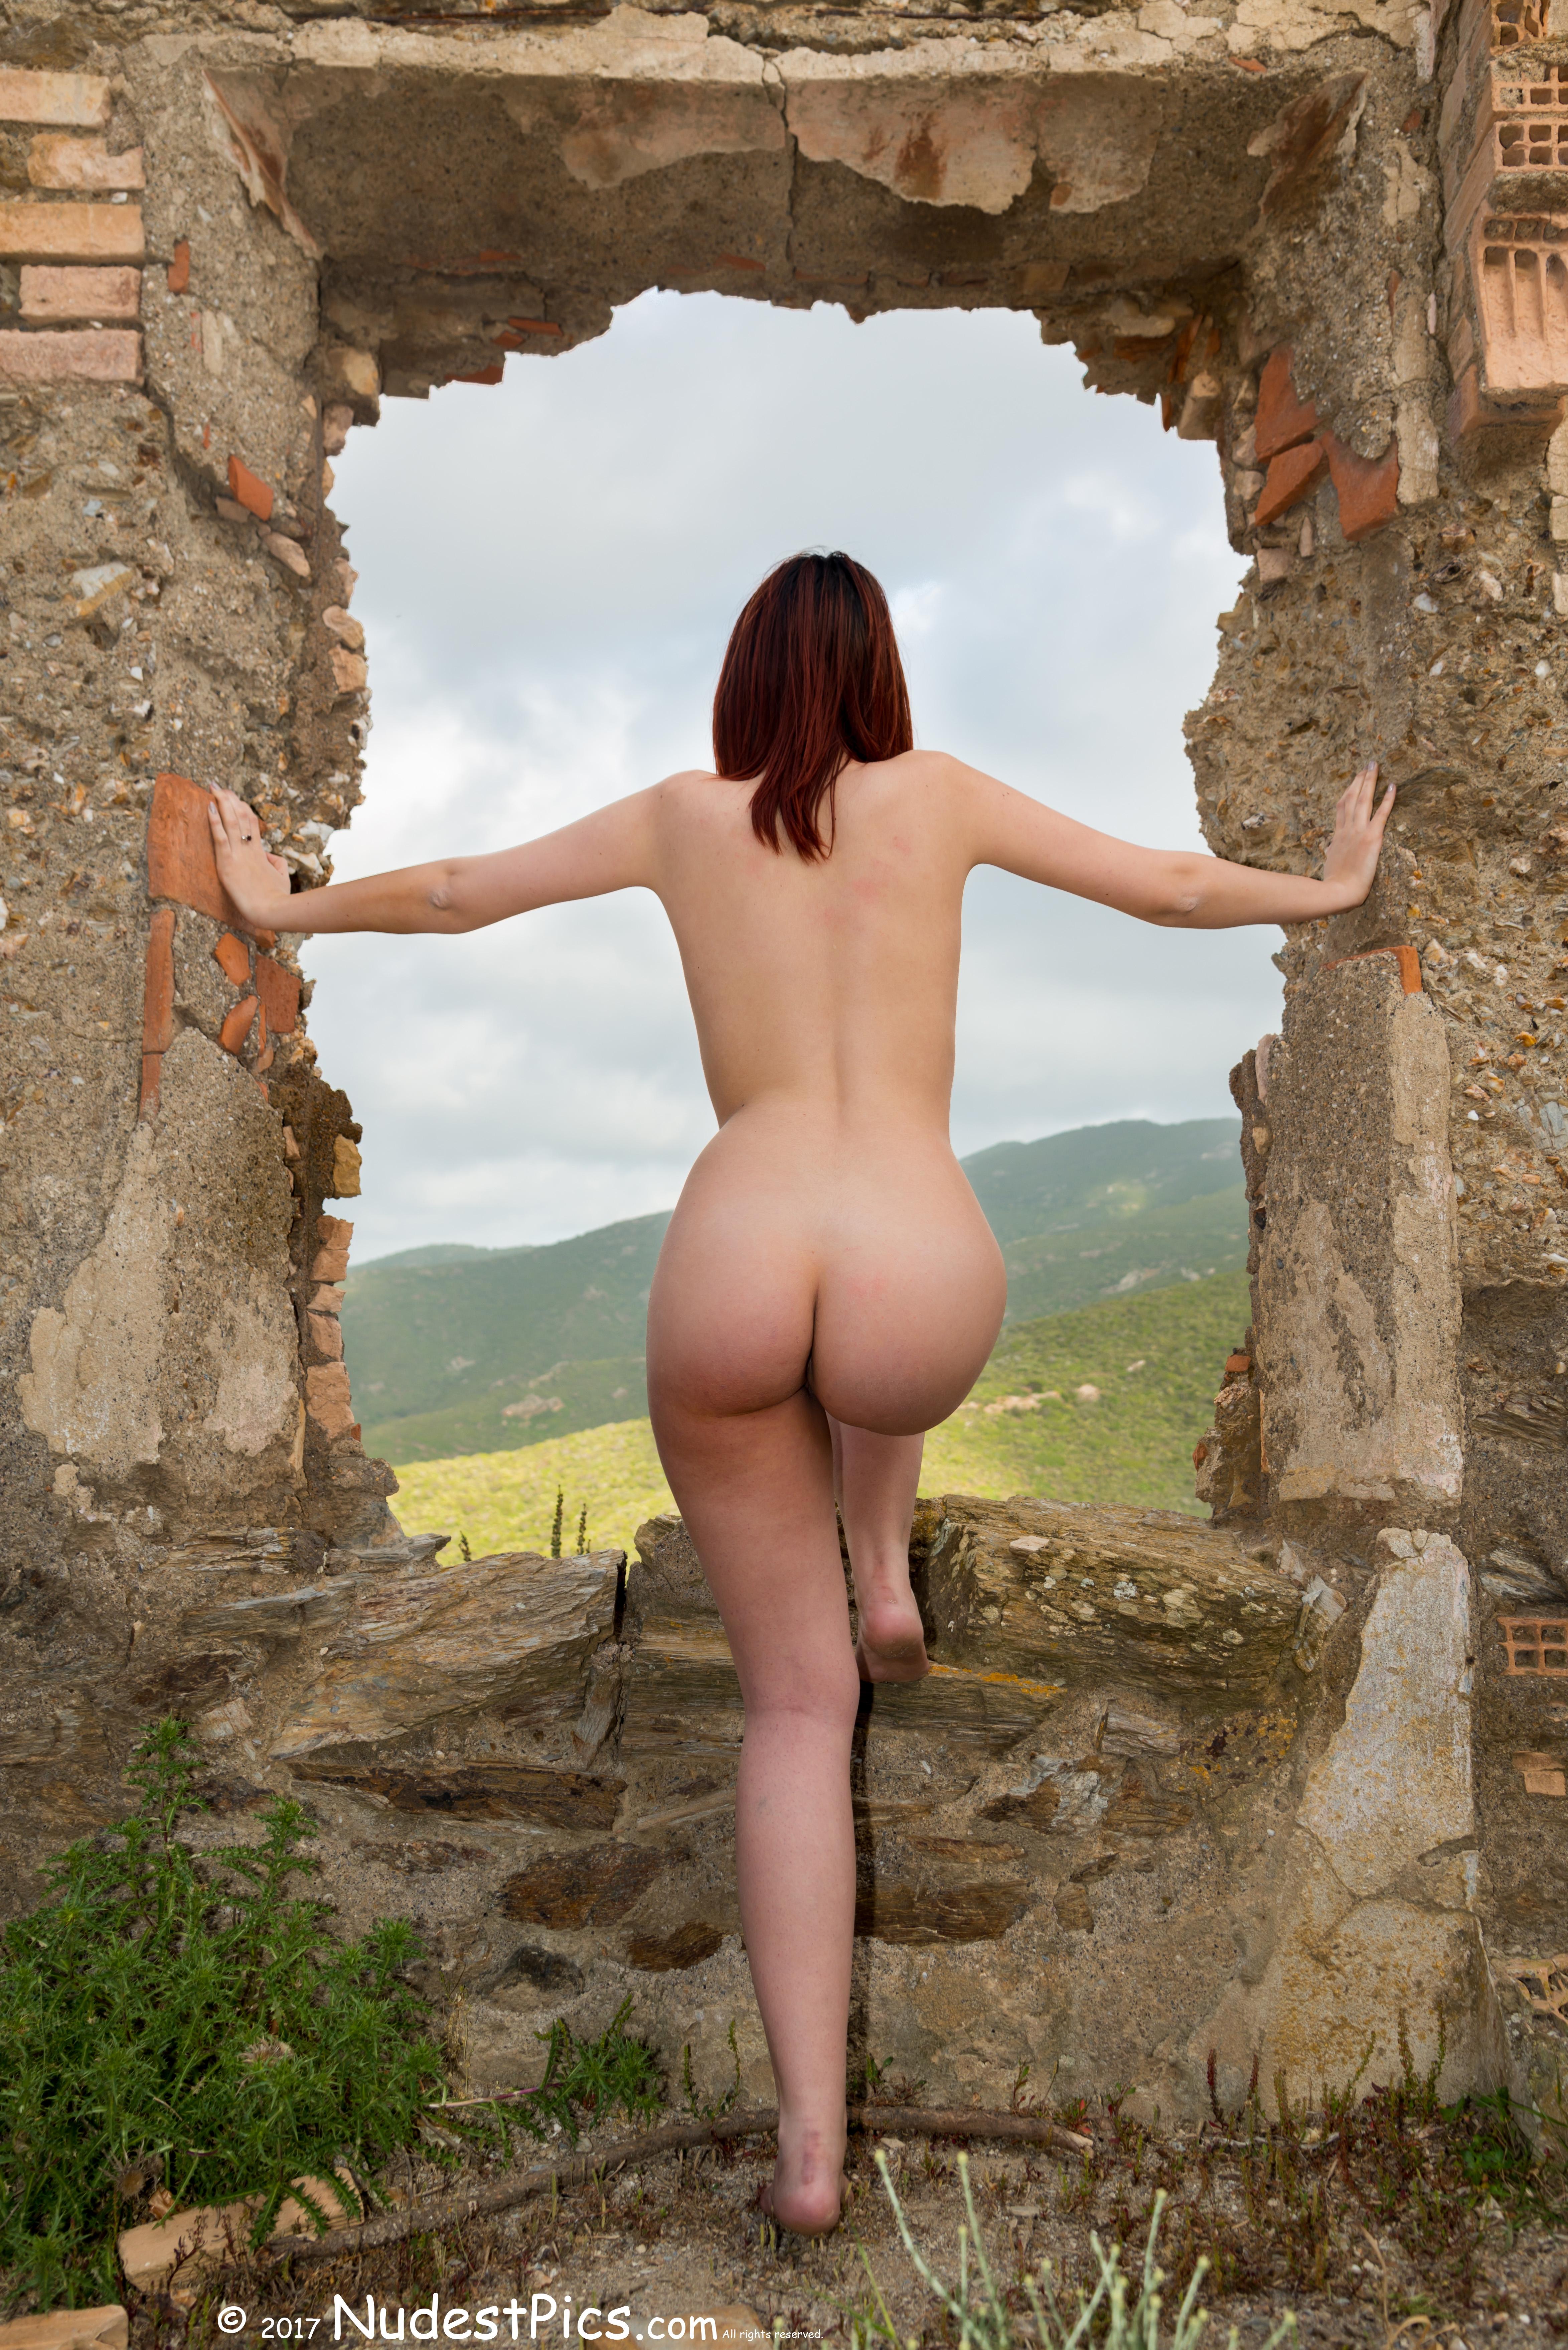 Nude Girl Watching Nature through Ruined Window HD